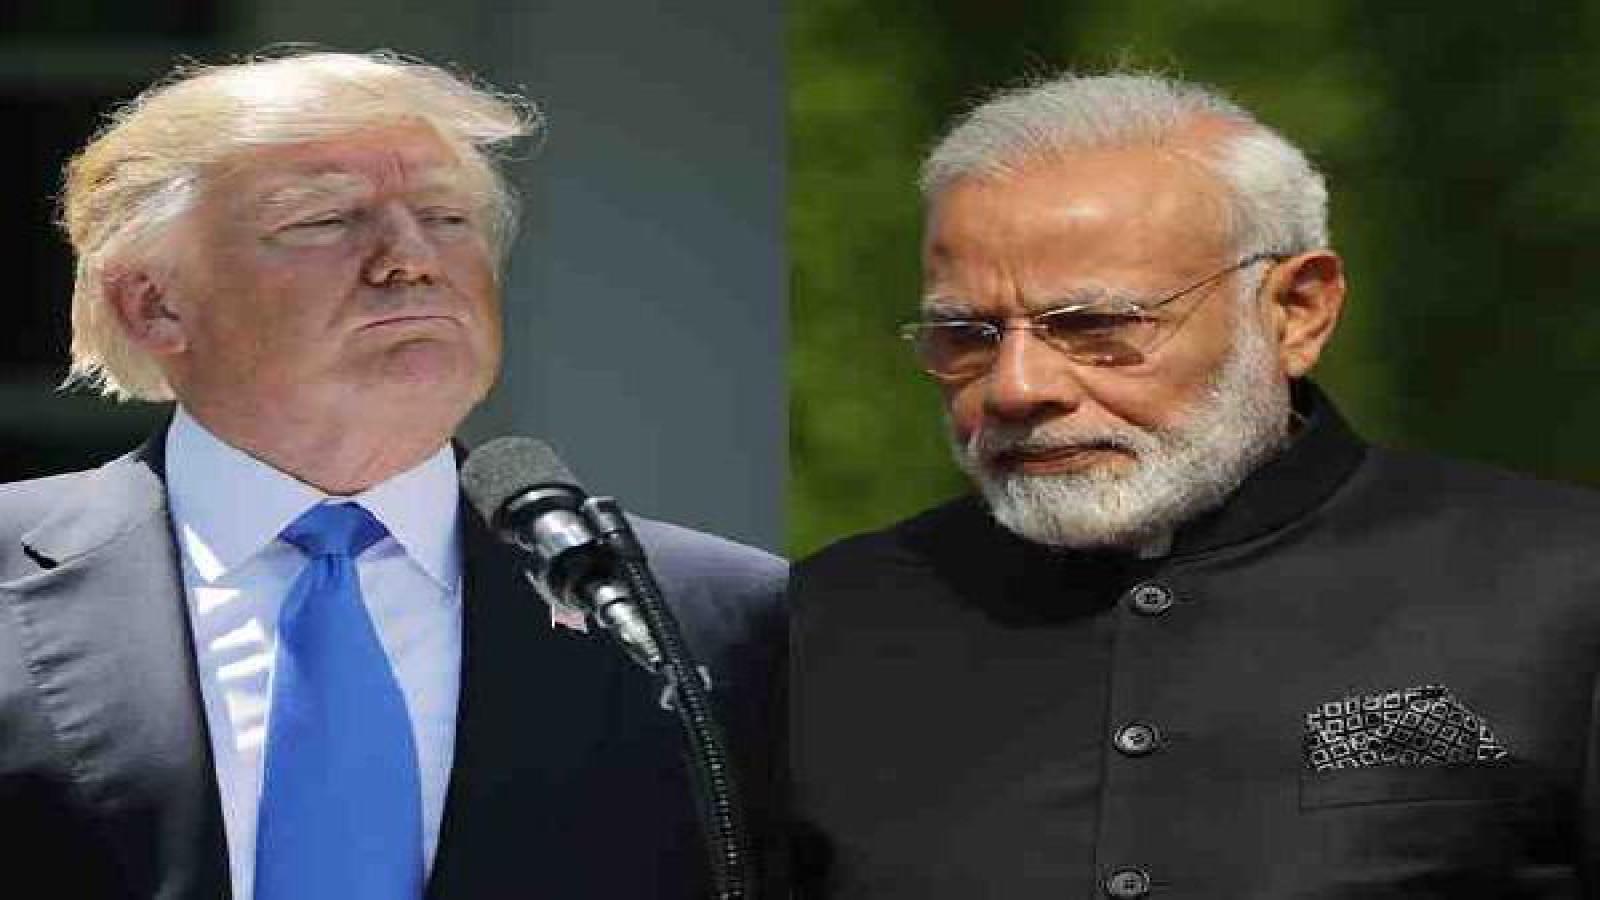 pm-modi-us-prez-trump-to-meet-at-g-20-summit-sidelines-in-osaka